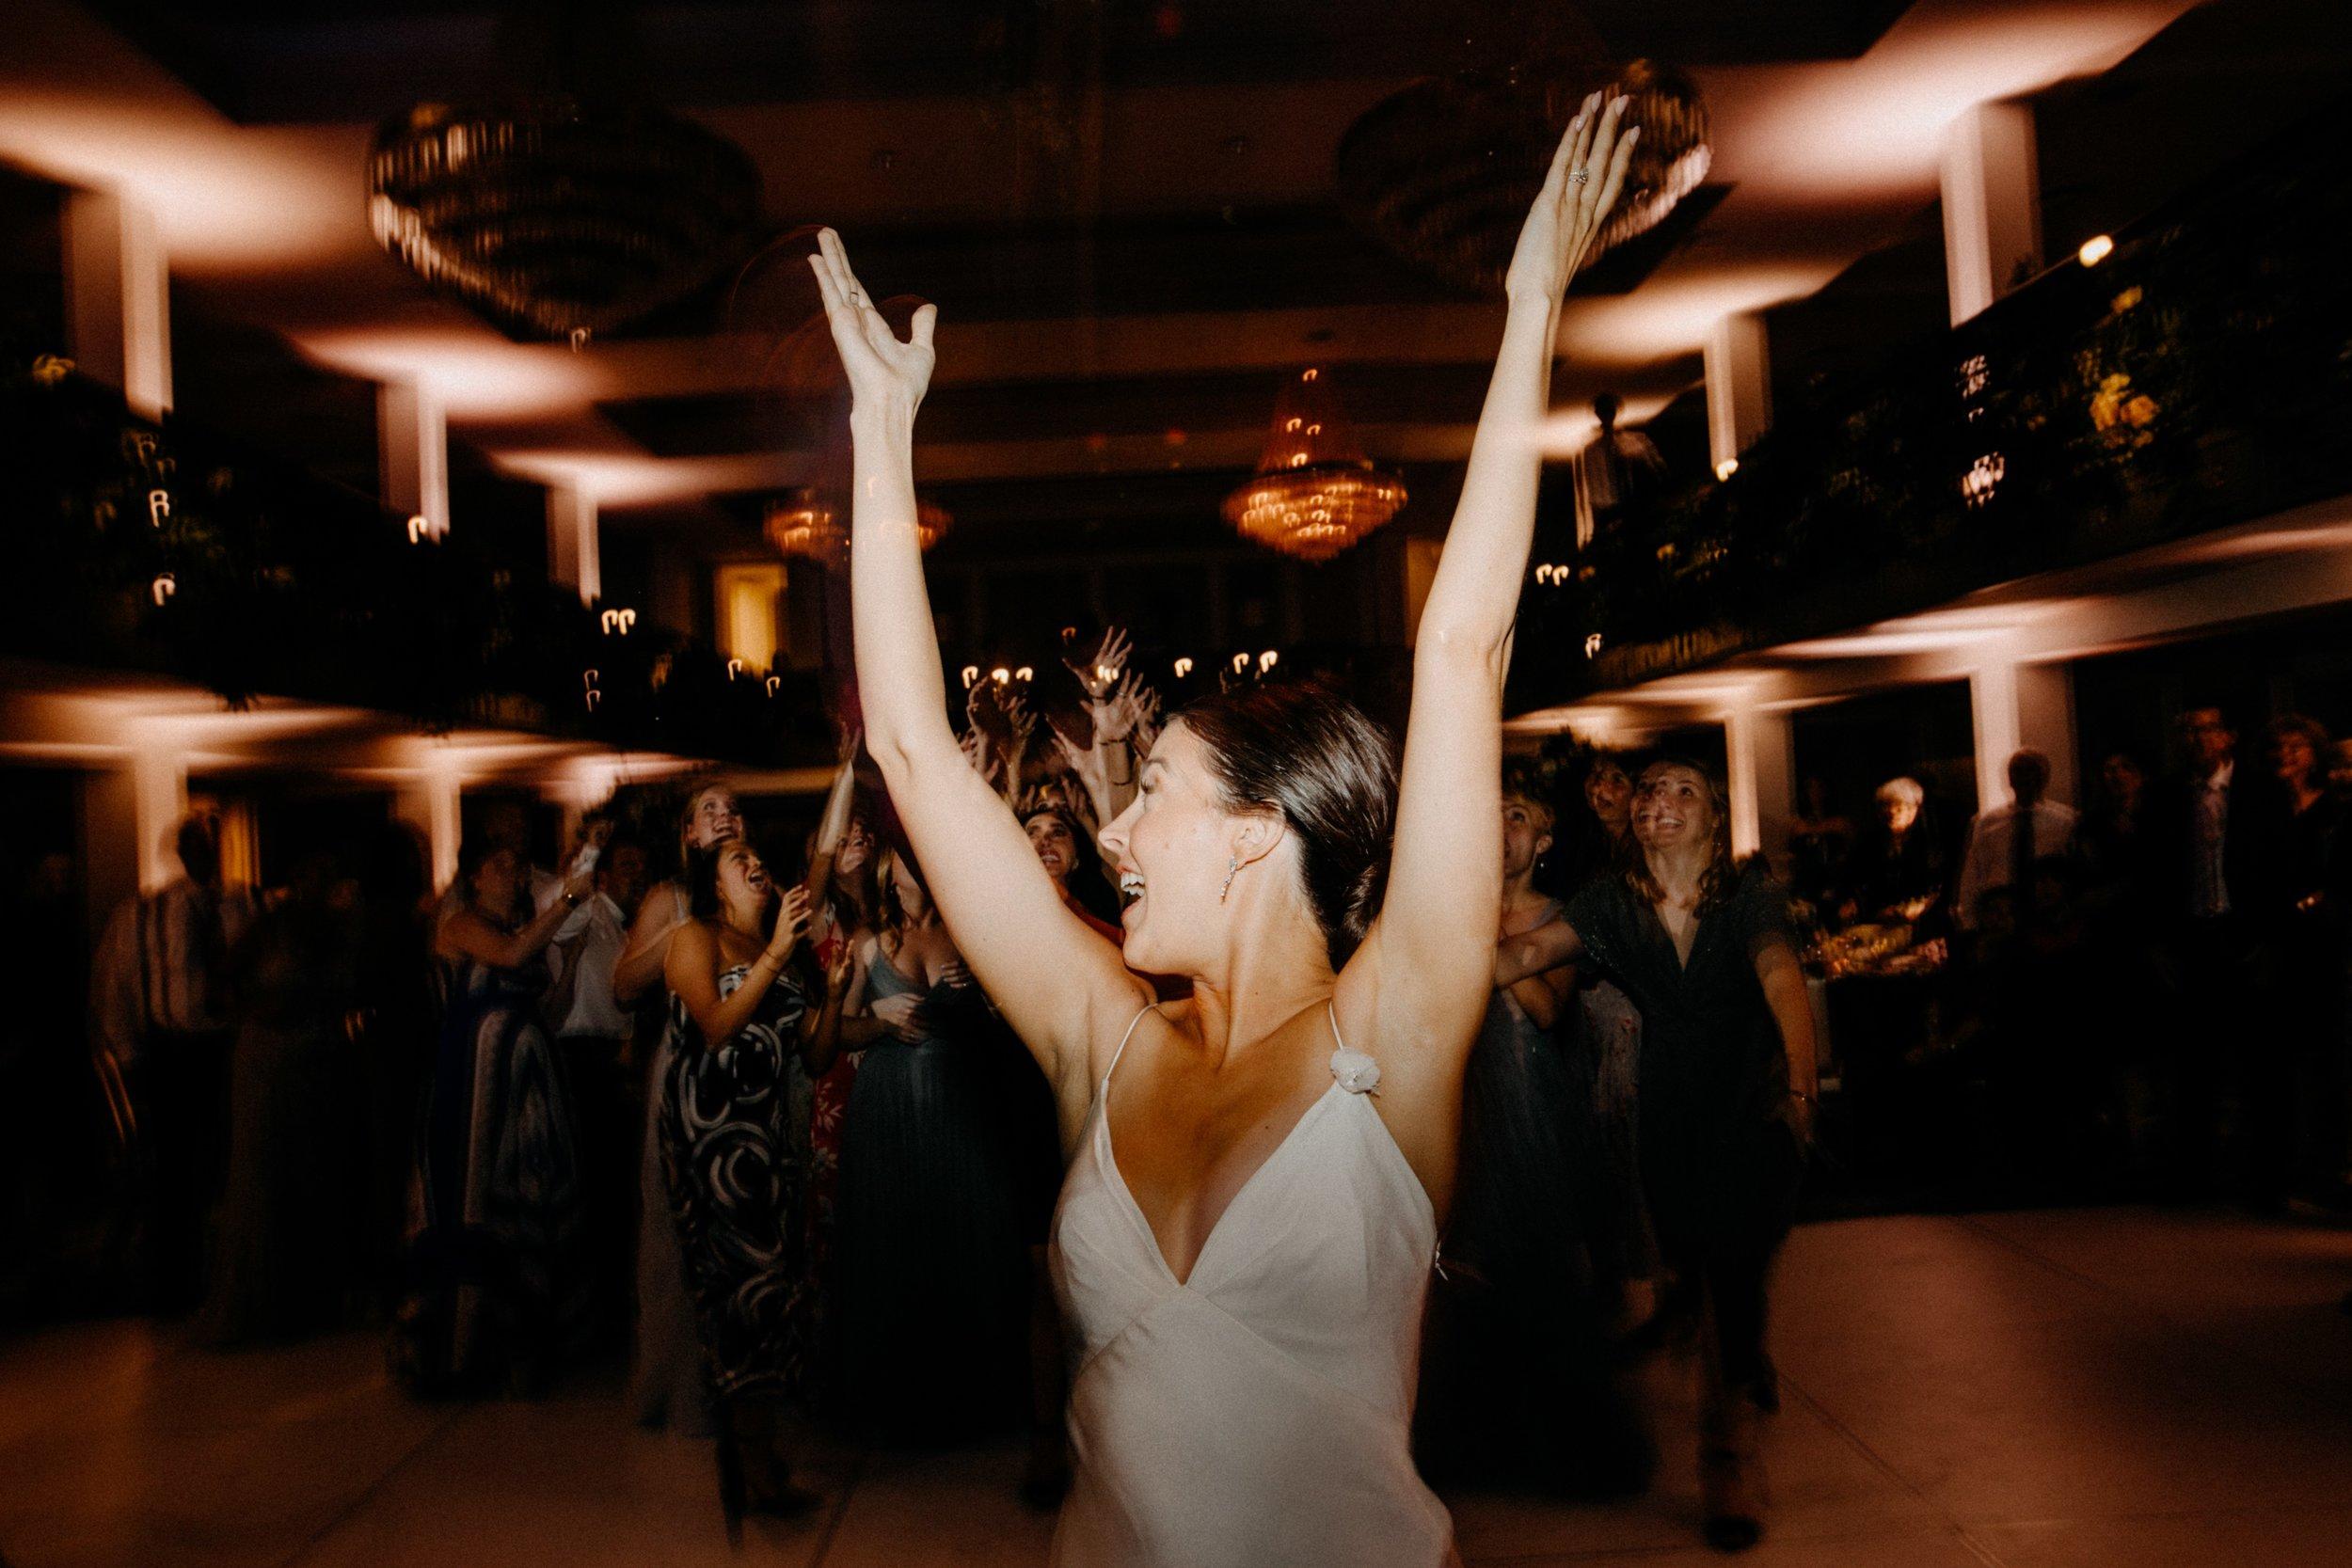 st-anthony-hotel-wedding-photography-10178san-antonio.JPG